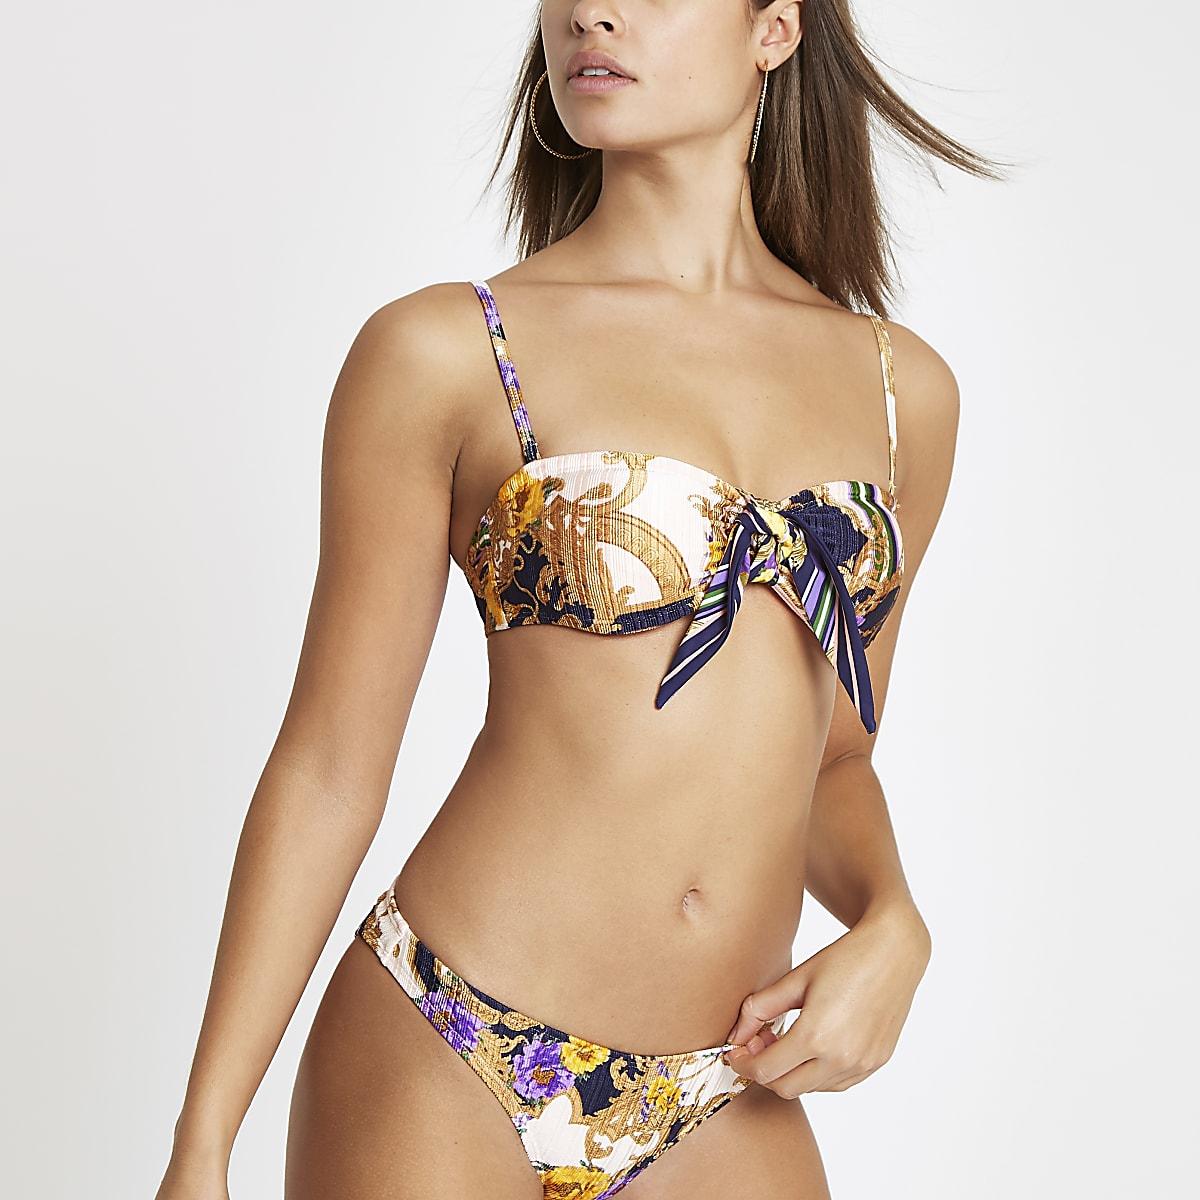 A j langer bikini